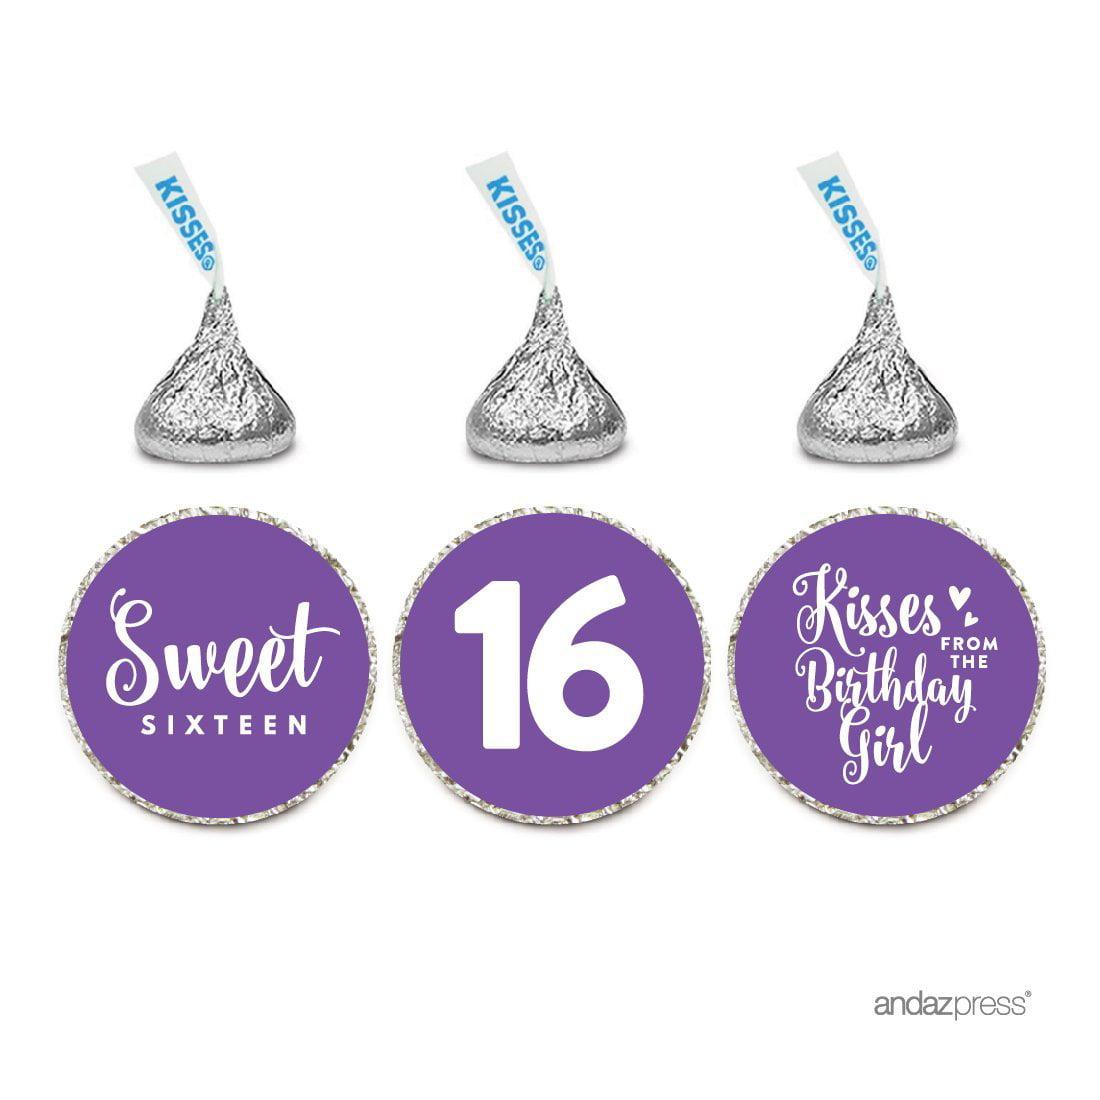 Chocolate Drop Labels Trio, Fits Hershey's Kisses, Sweet 16 Birthday, Royal Purple, 216-Pack